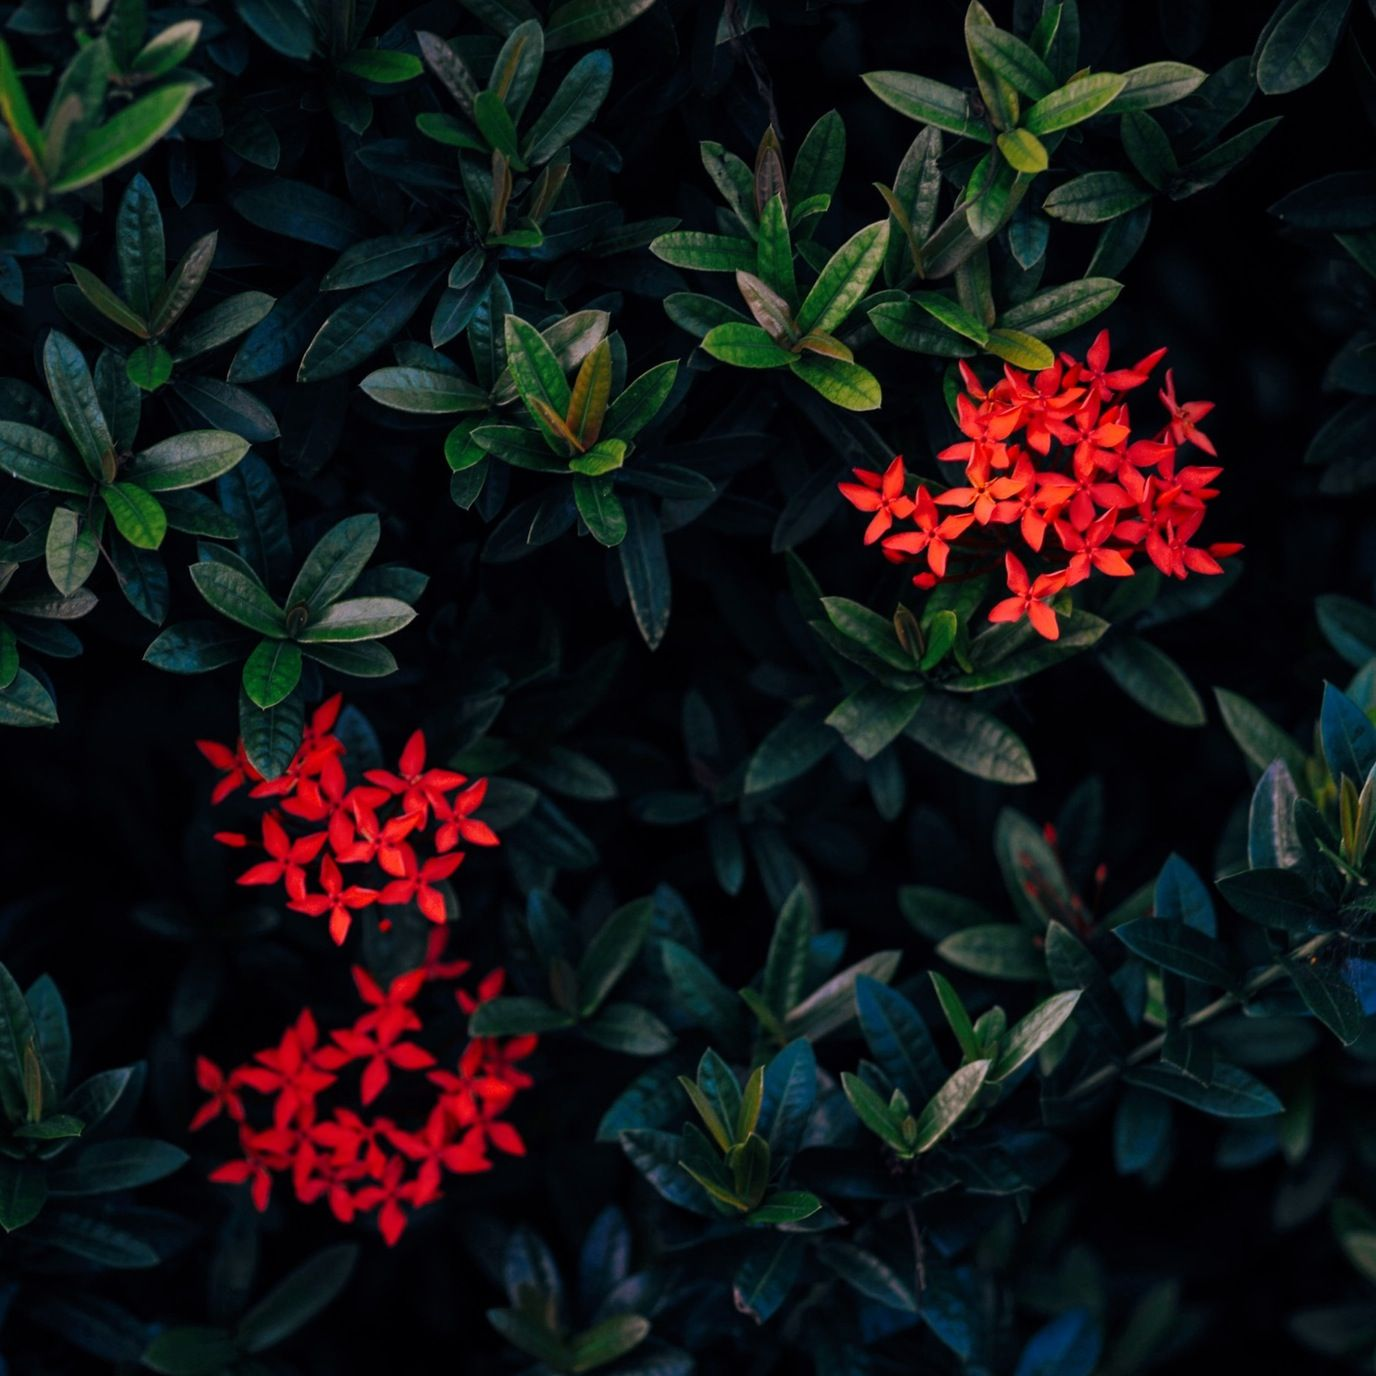 Flowers /  photo by Bea Quisumbing